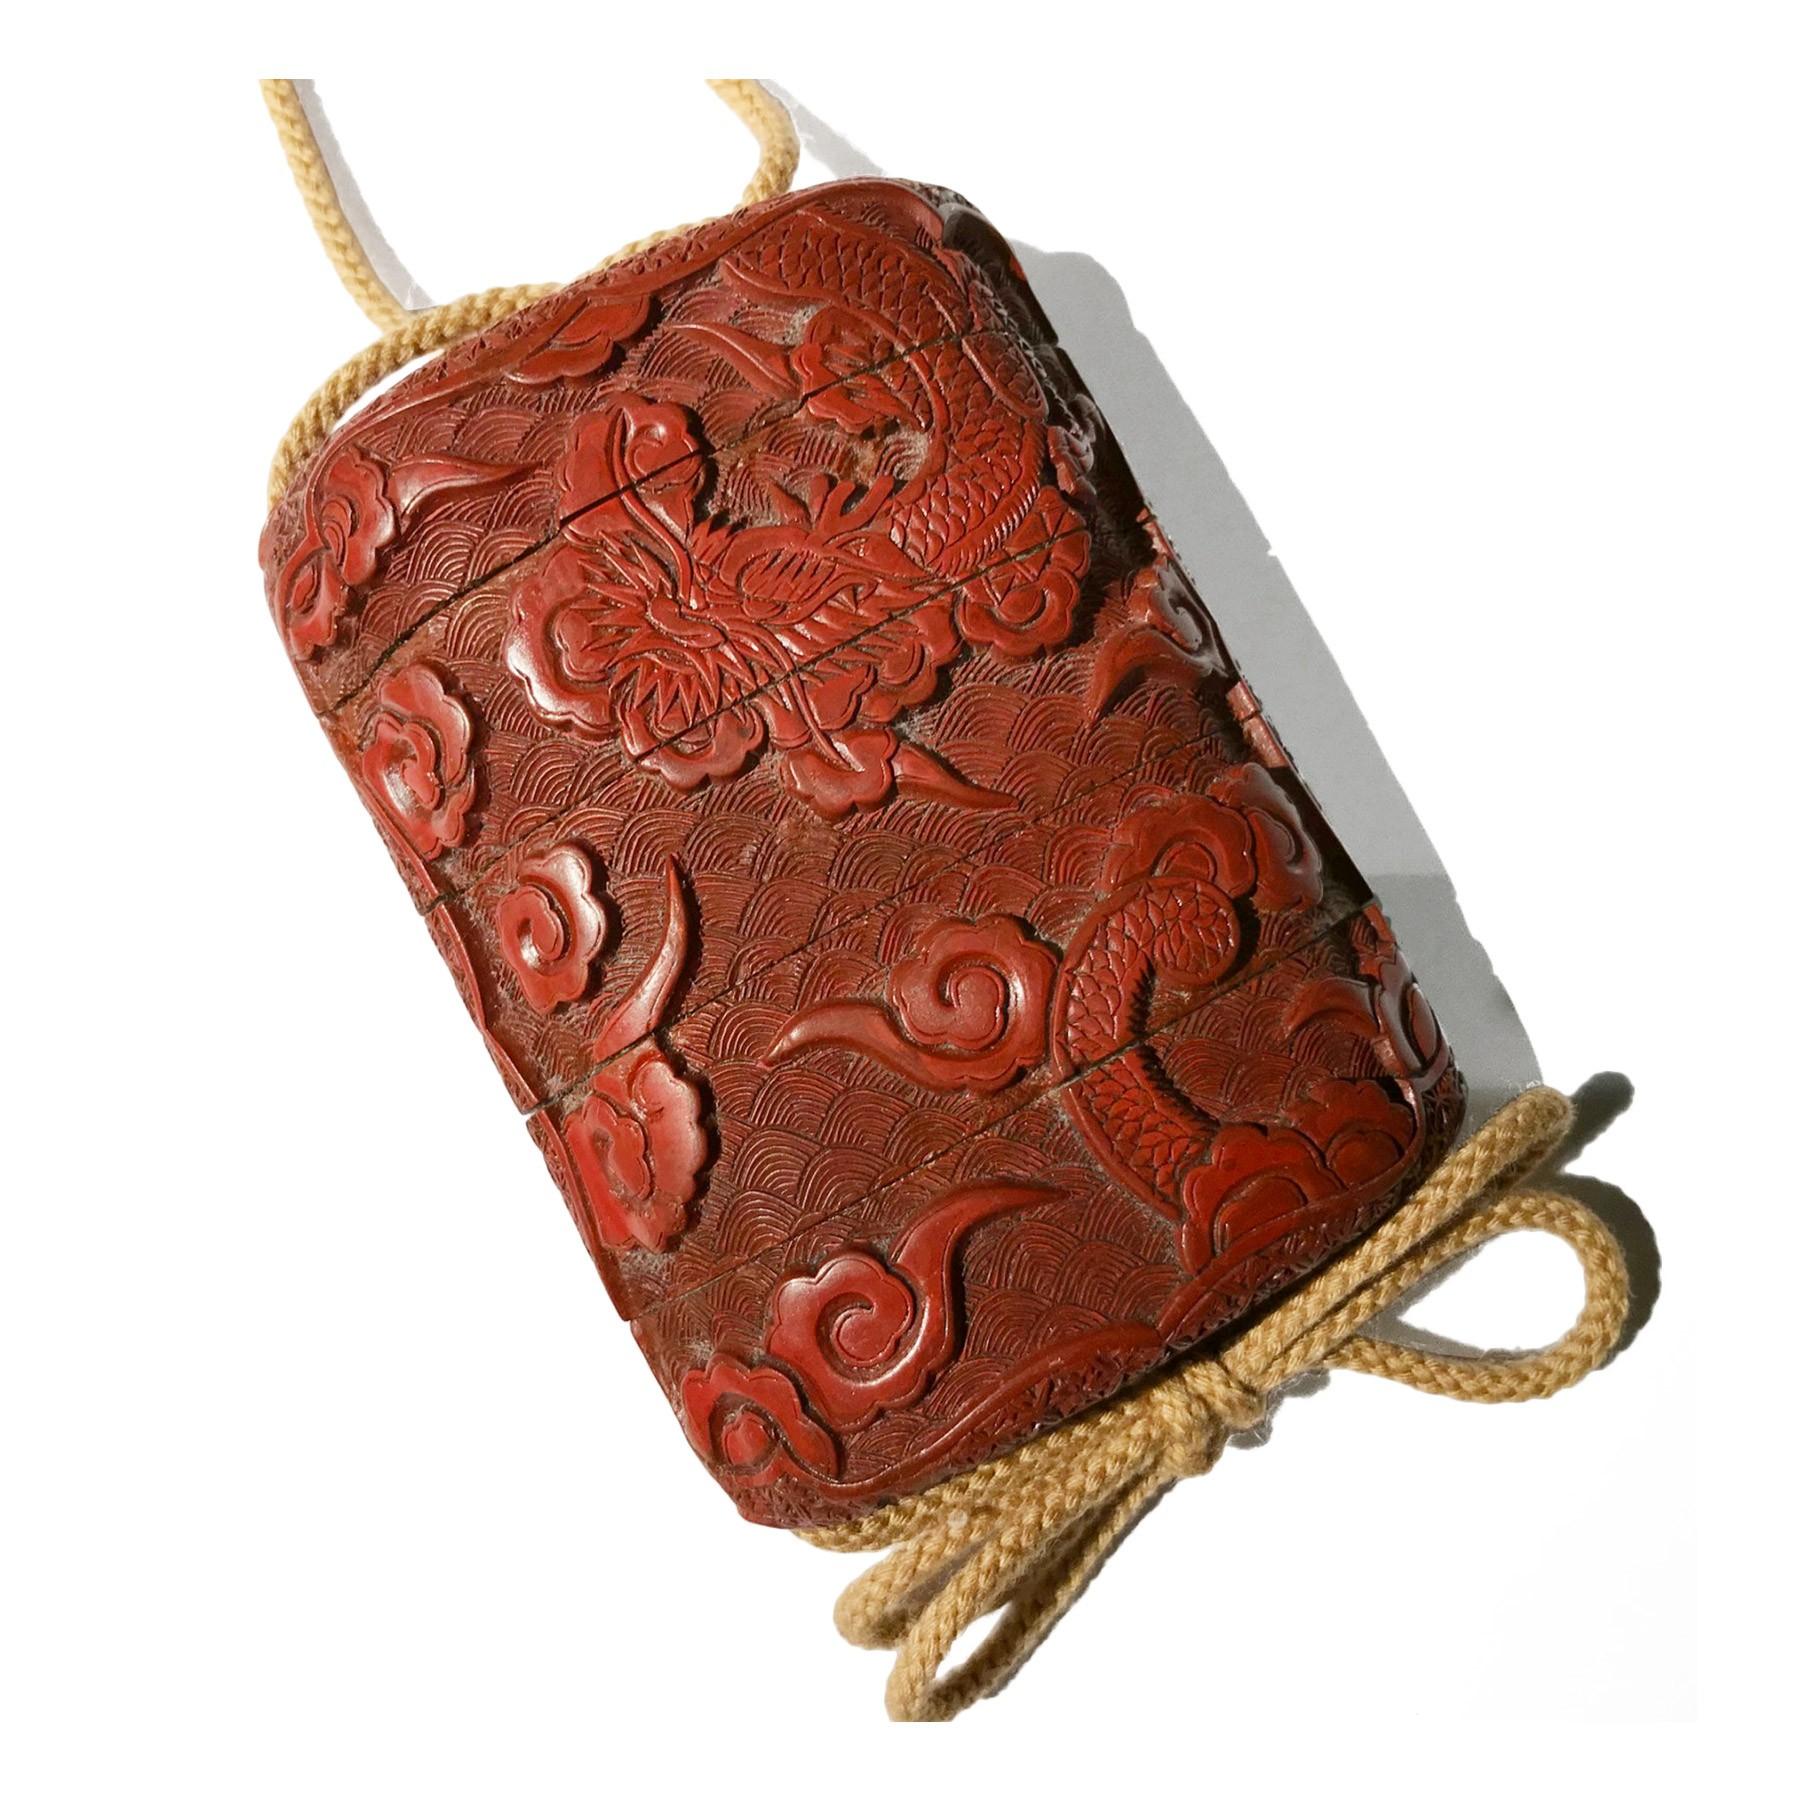 Tsuishu Red Lacquer Inro Japan Edo Period Ref 72601